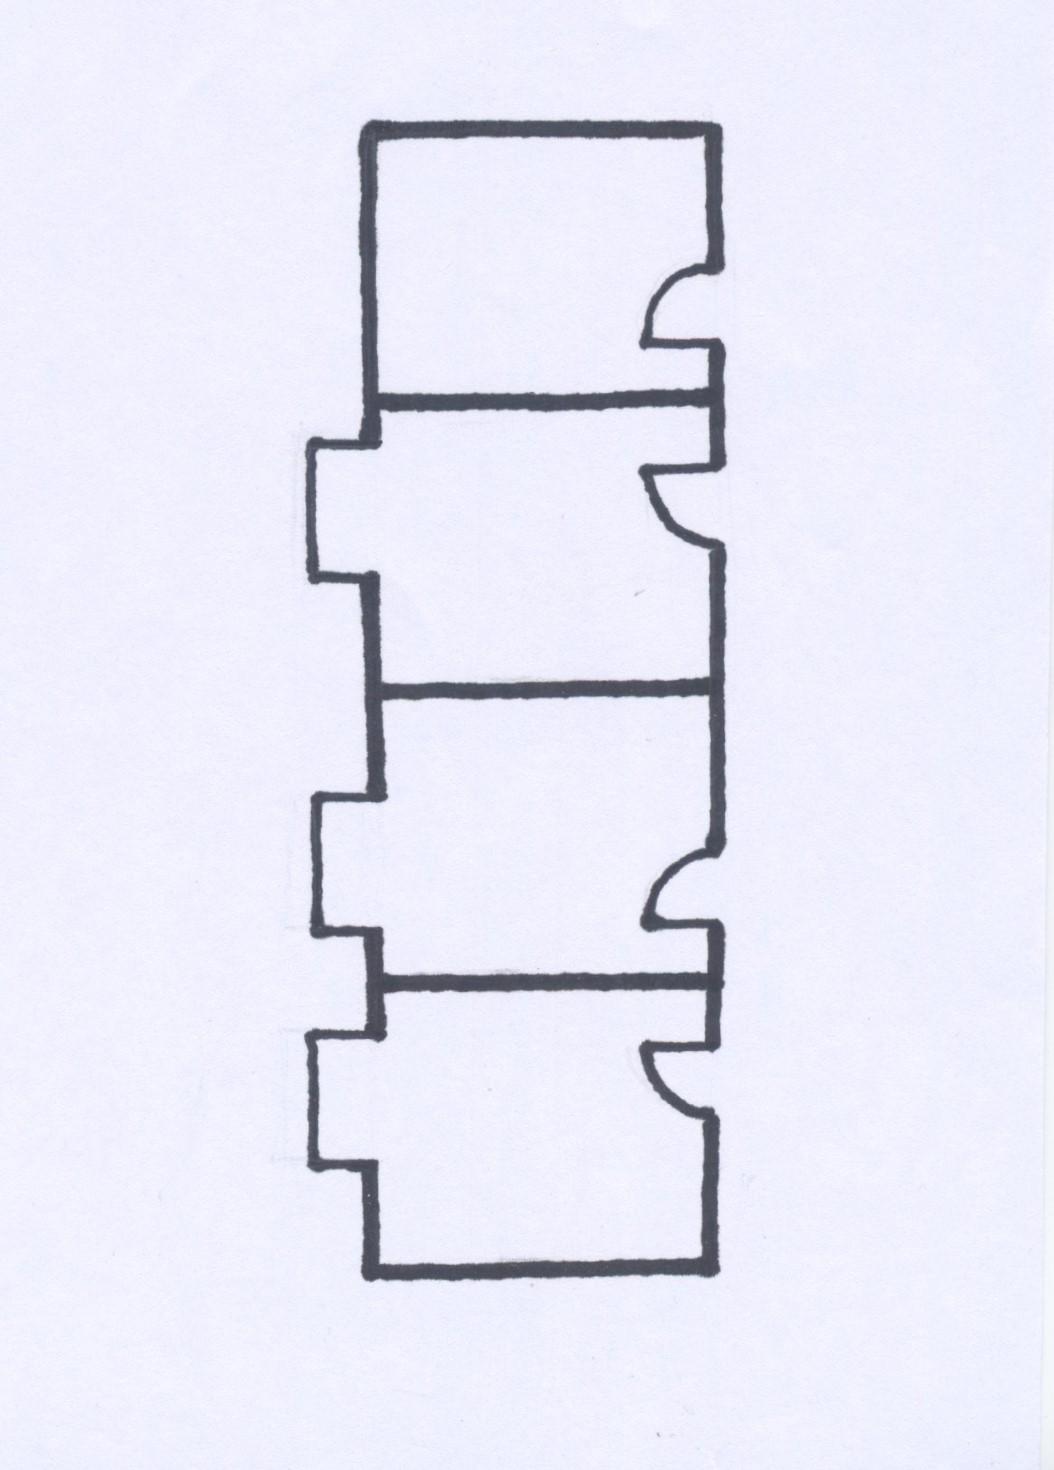 W11-4